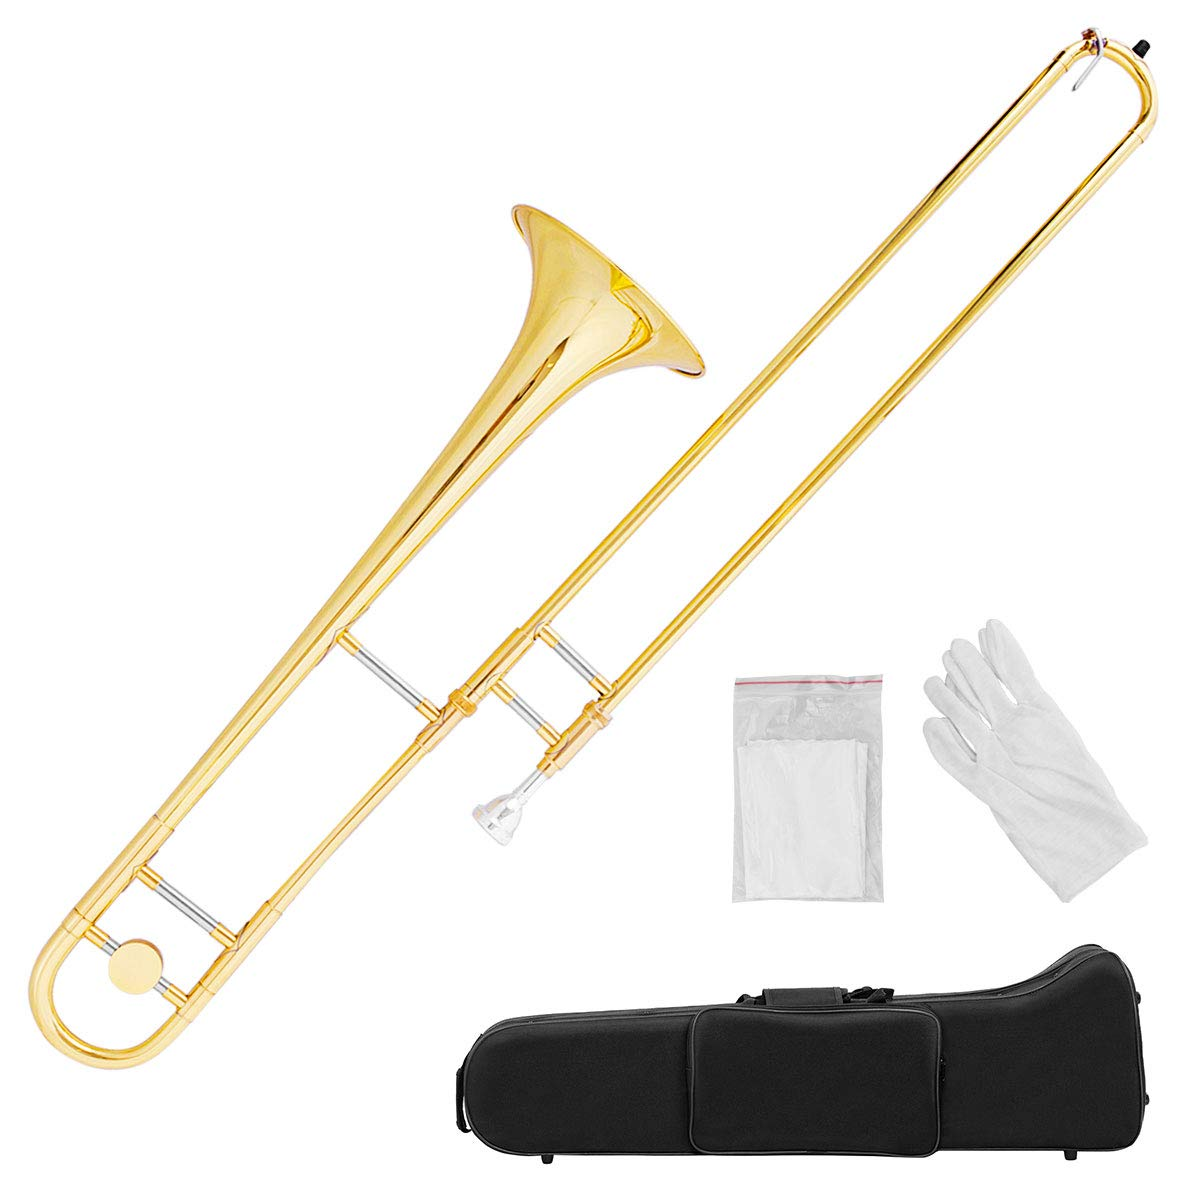 Costzon B Flat Tenor Slide Trombone Gold Brass, Sound for Standard Student Beginner Trombone w/Case, Gloves, Mouthpiece, Portable